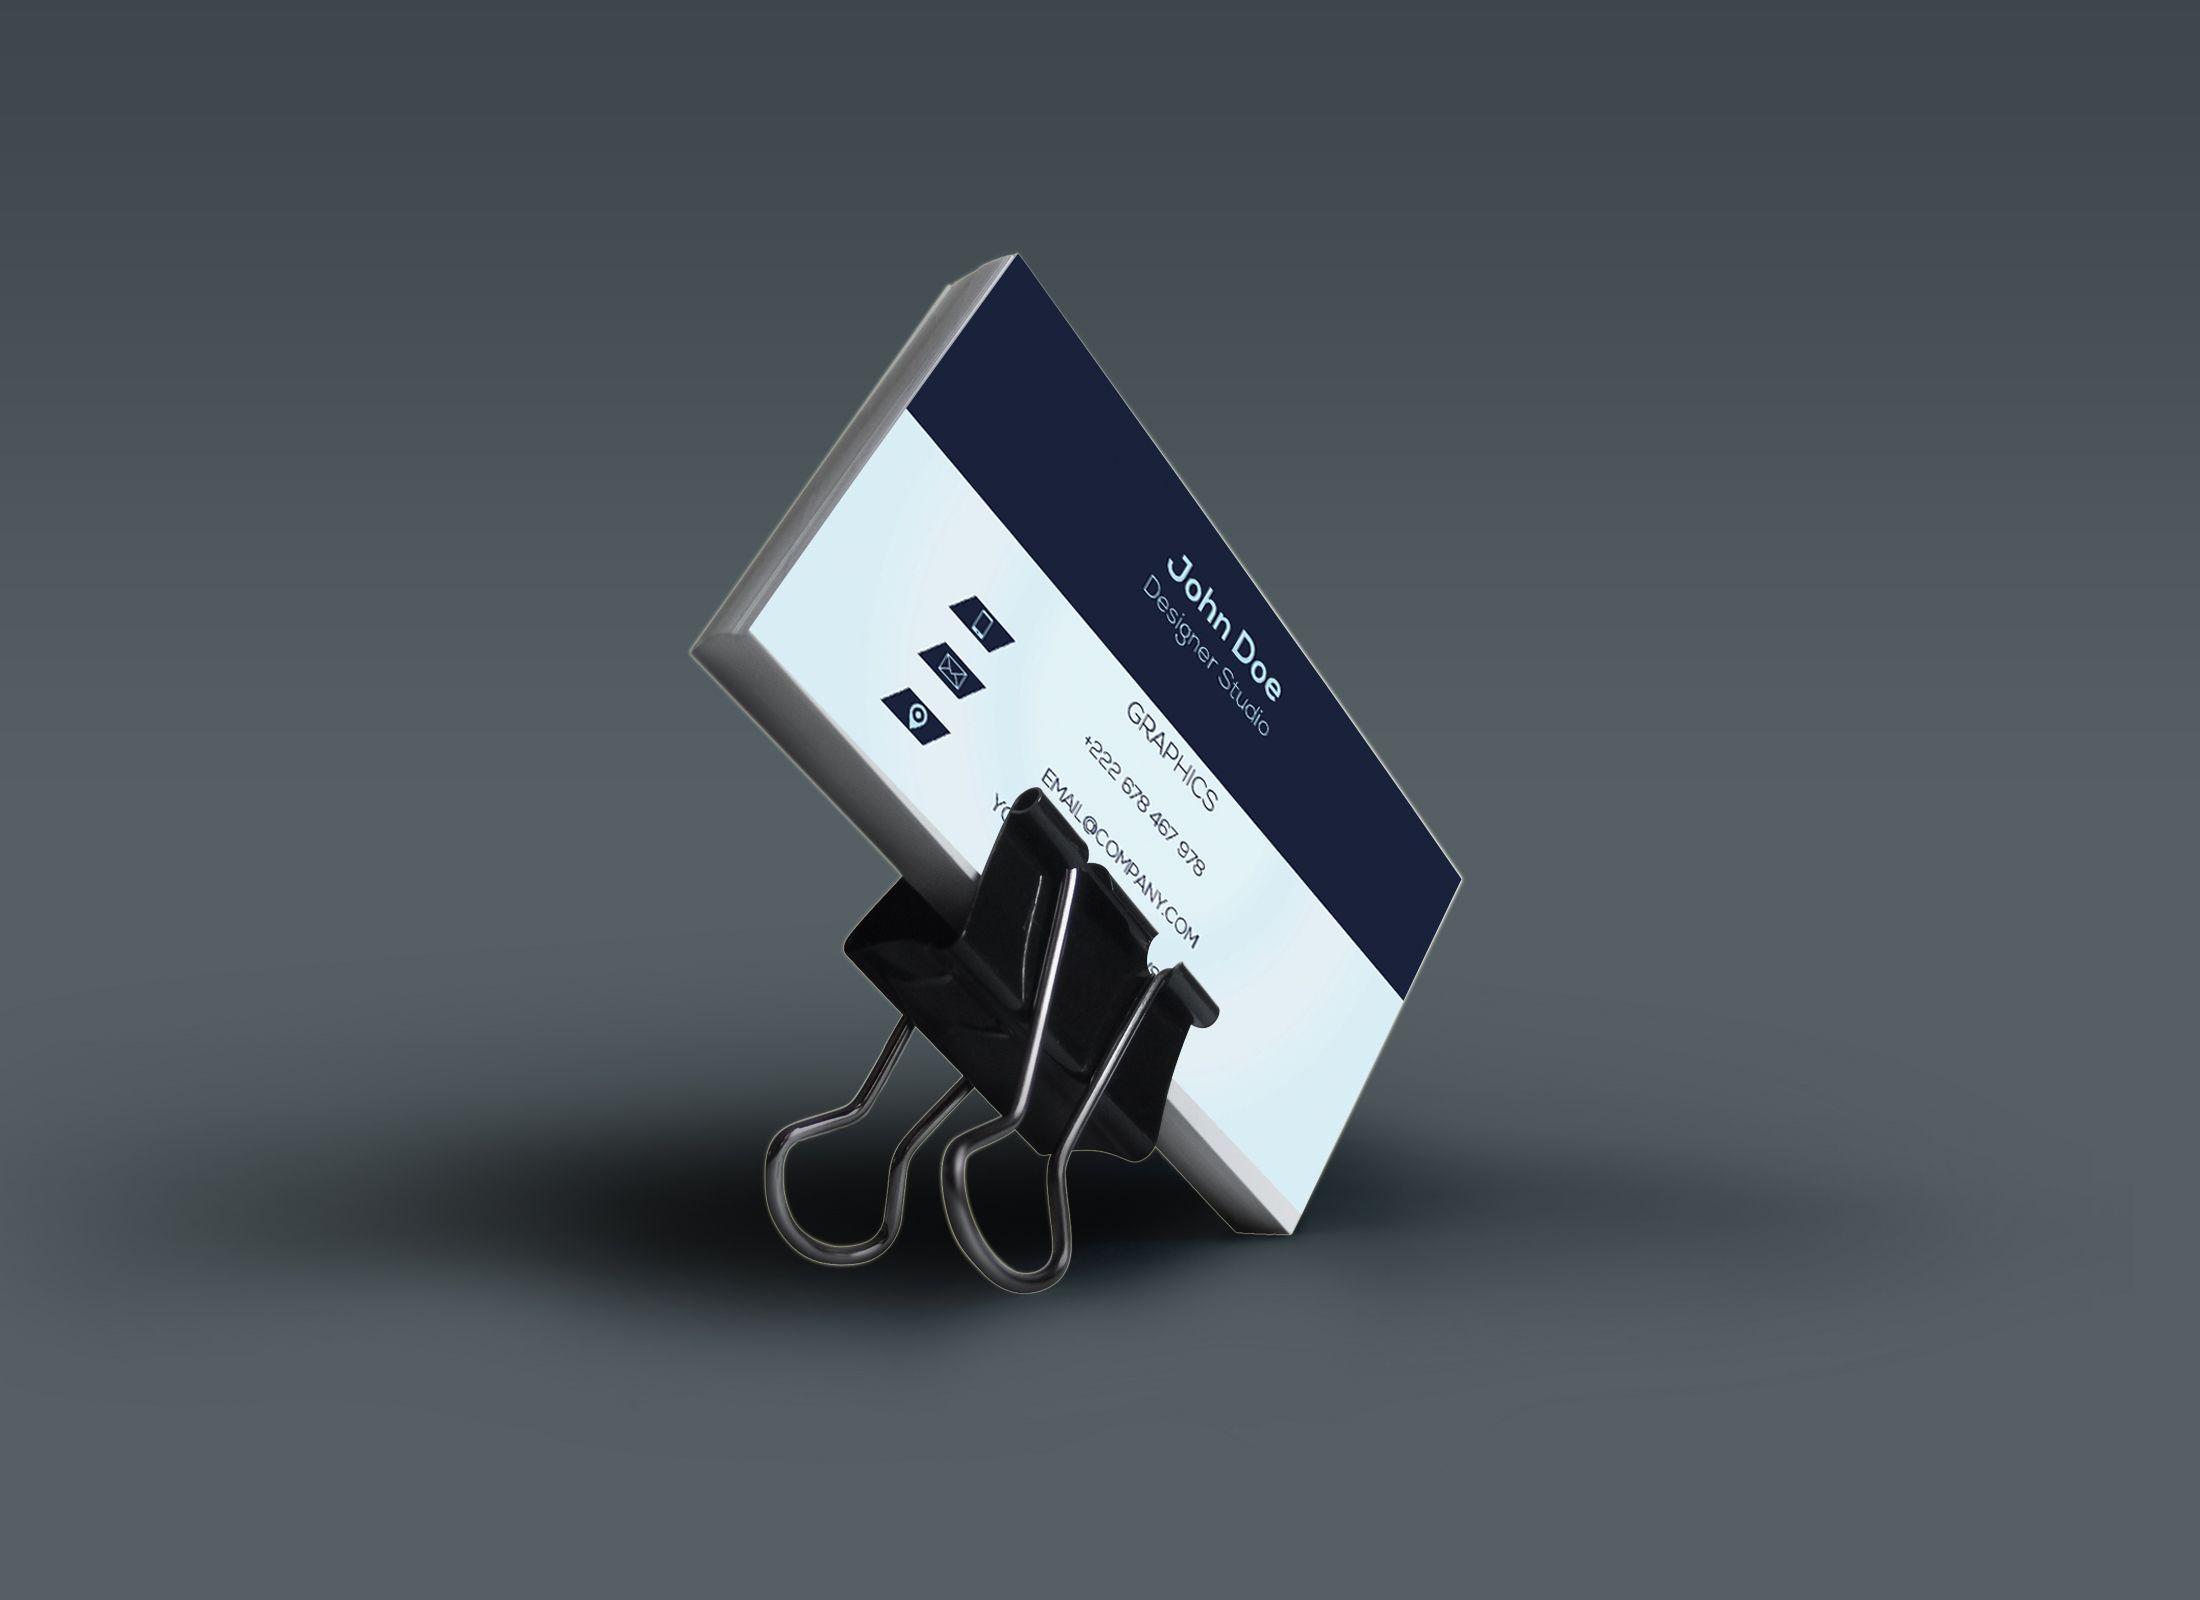 Professional business card design templates professional business professional business card design templates professional business card design graphic design inspiration fbccfo Images